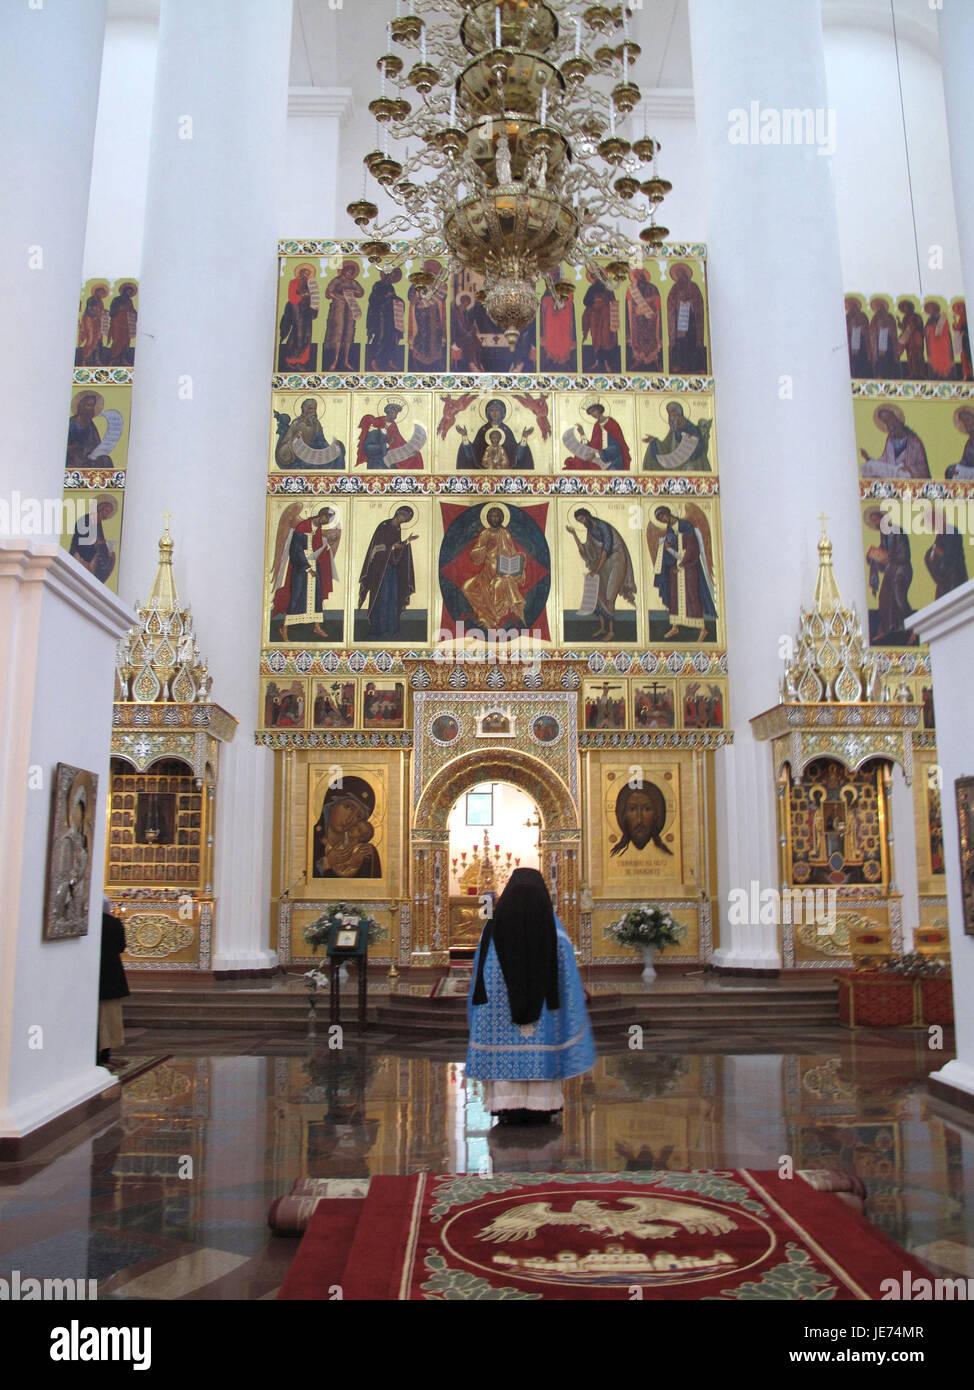 Russia, Jaroslawl, church, inside, priest, person, man, priest, church, altar, golden, Russian-orthodox, architecture, - Stock Image